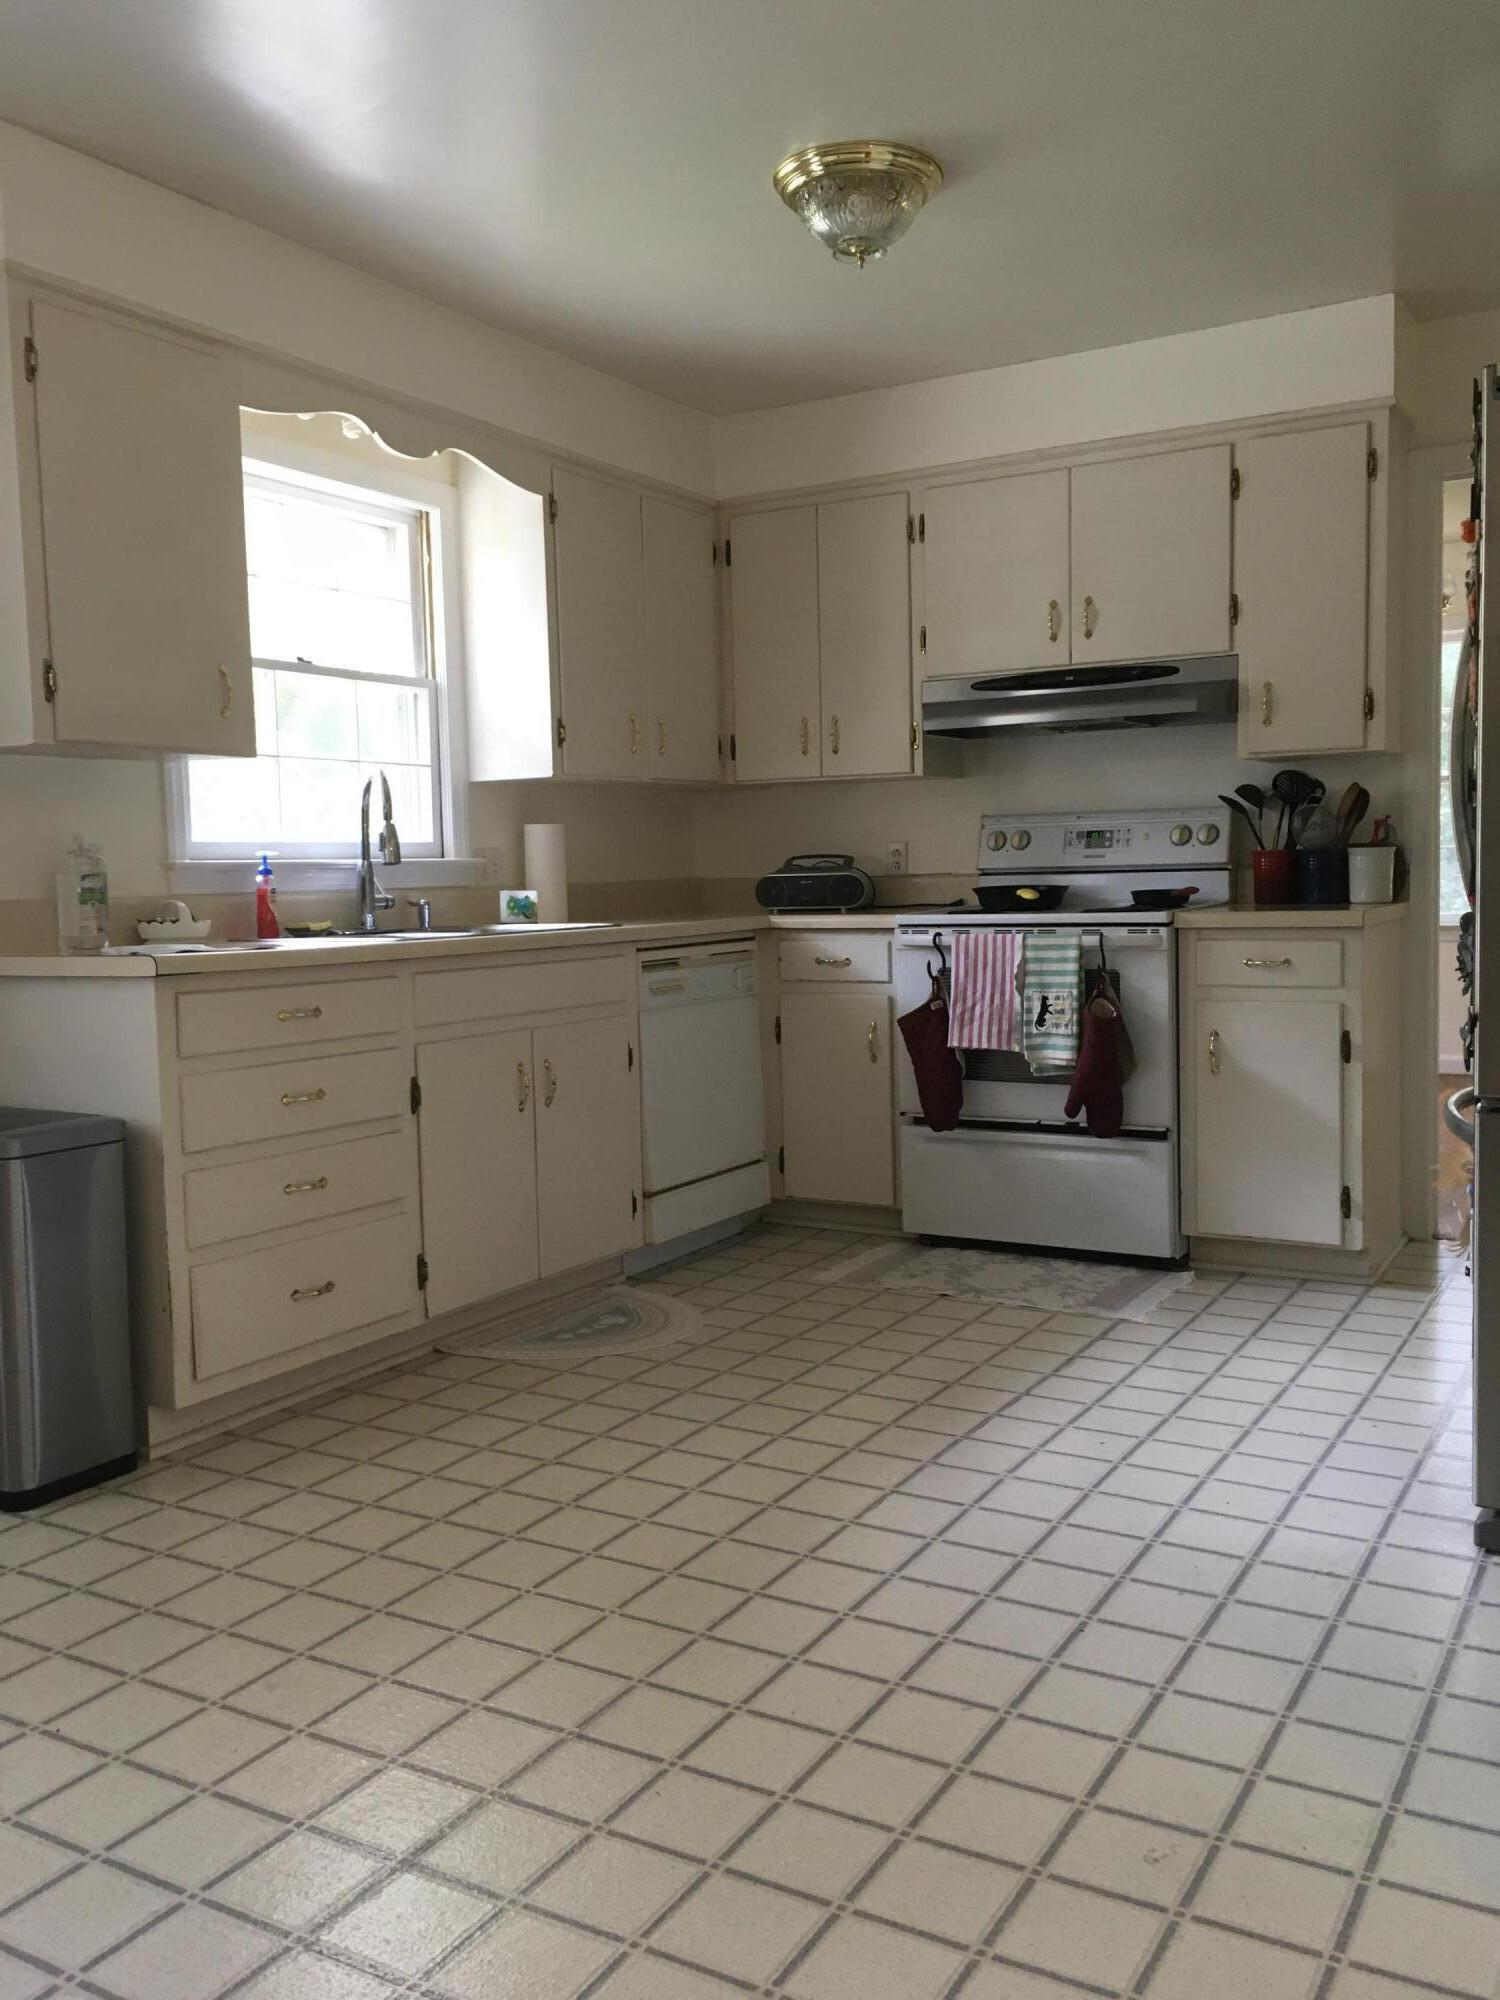 Cooper Estates Homes For Sale - 1077 Cottingham, Mount Pleasant, SC - 6